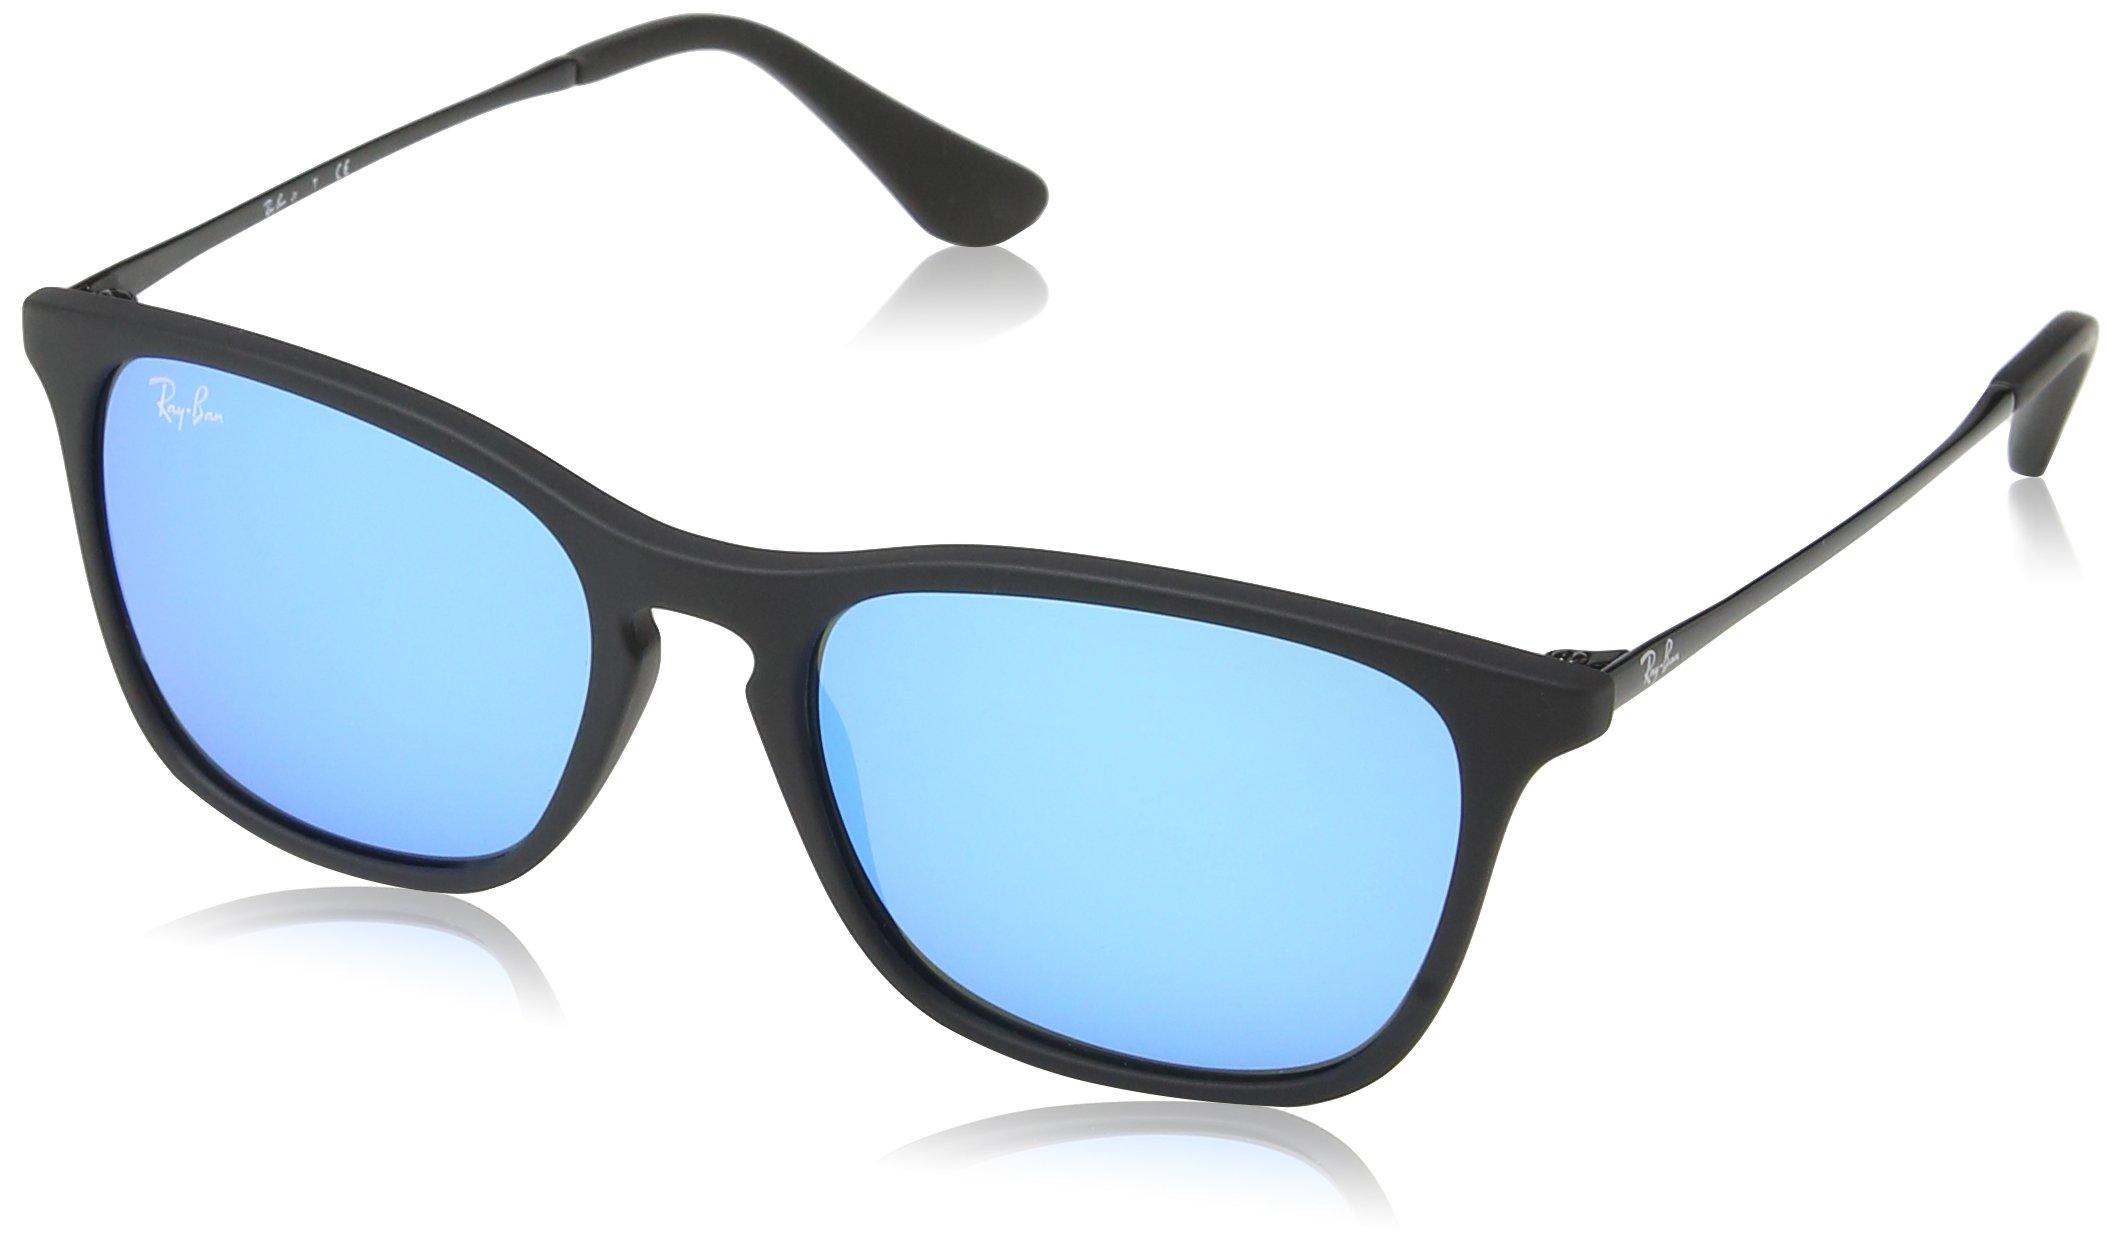 Ray-Ban Junior RJ9061S Chris Kids Rectangular Sunglasses, Rubber Black, 49 mm